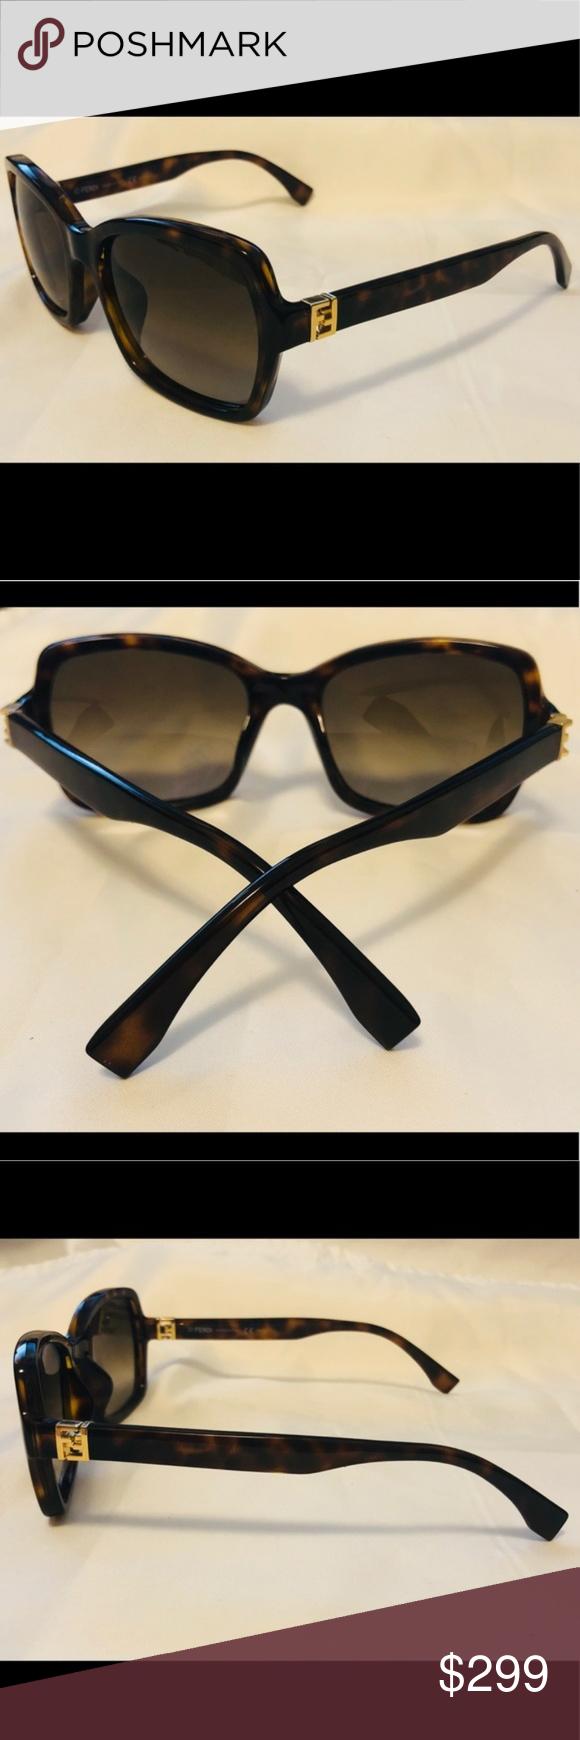 2f8ffc993c5 New Fendi Dark Havana Sunglasses FF 0007 S New Fendi Dark Havana Sunglasses  Condition New